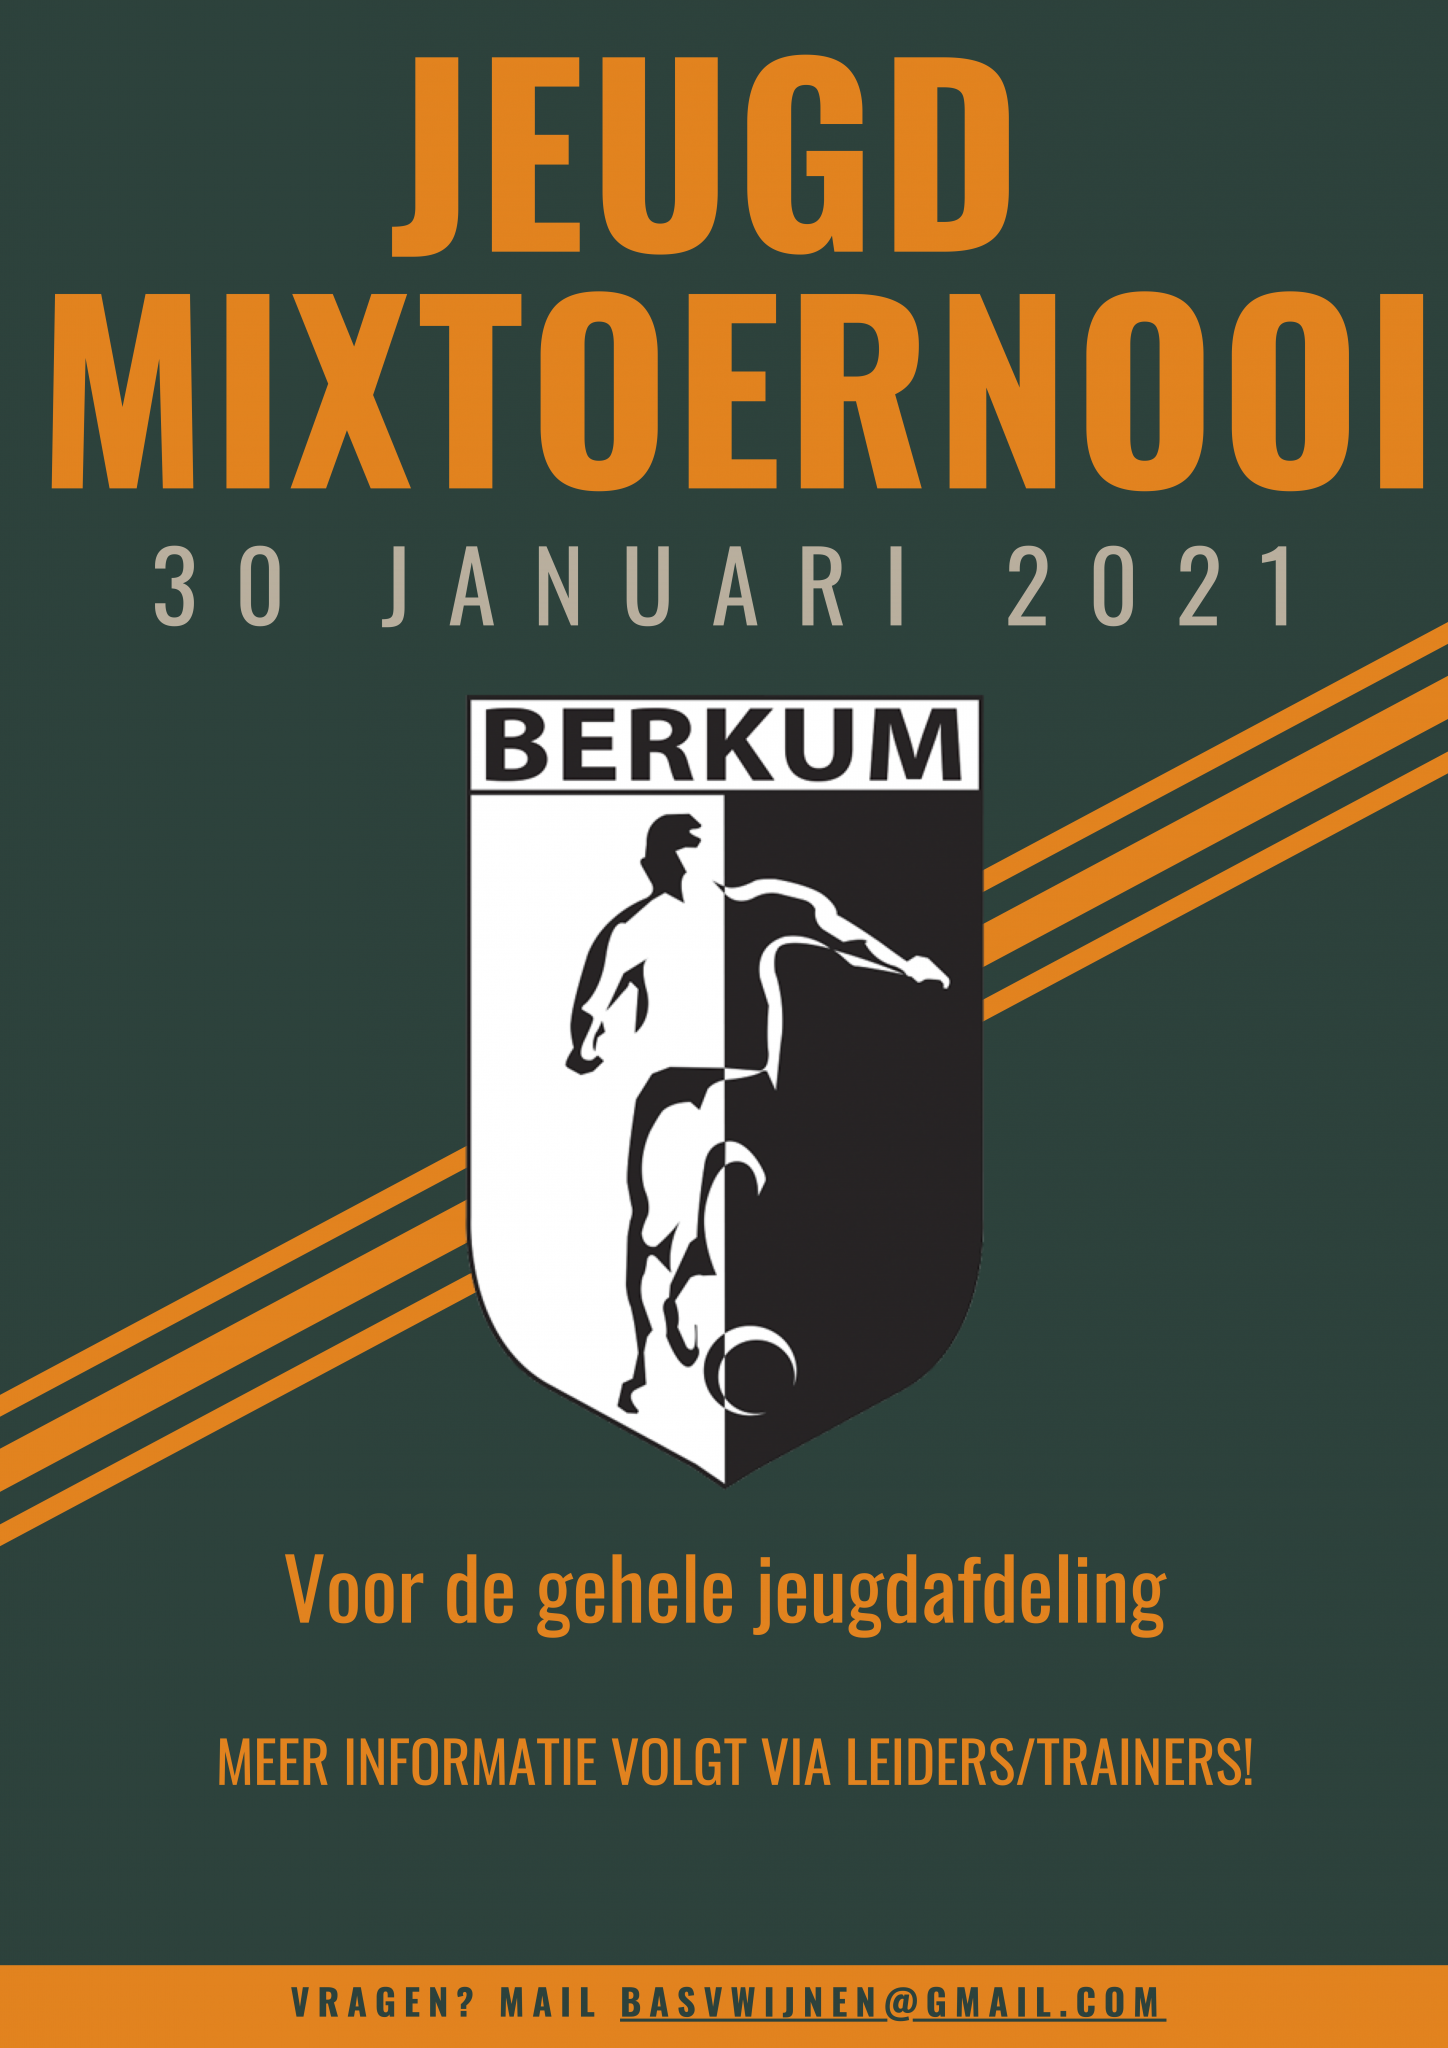 Jeugd mixtoernooi 30 januari